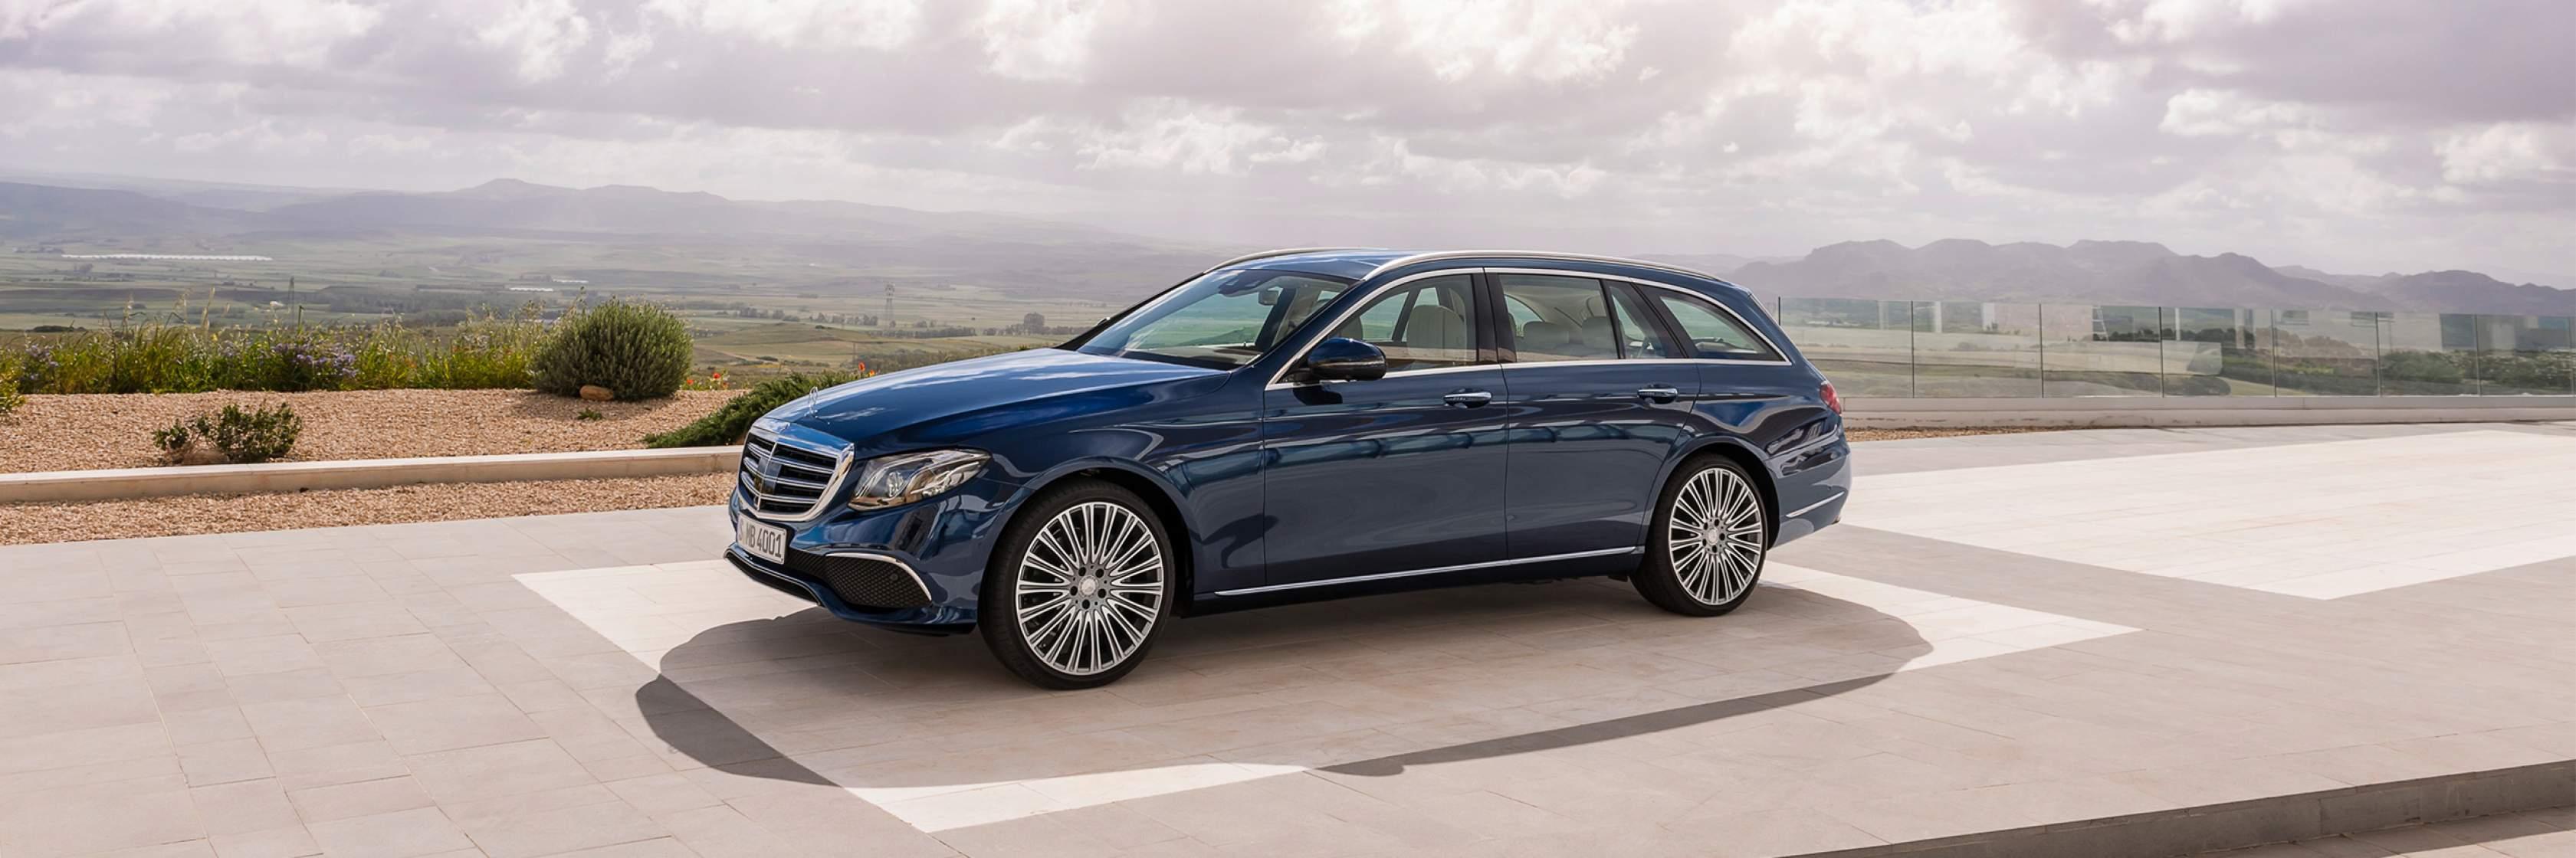 Інтер'єр та екстер'єр Mercedes–Benz E–Class Універсал